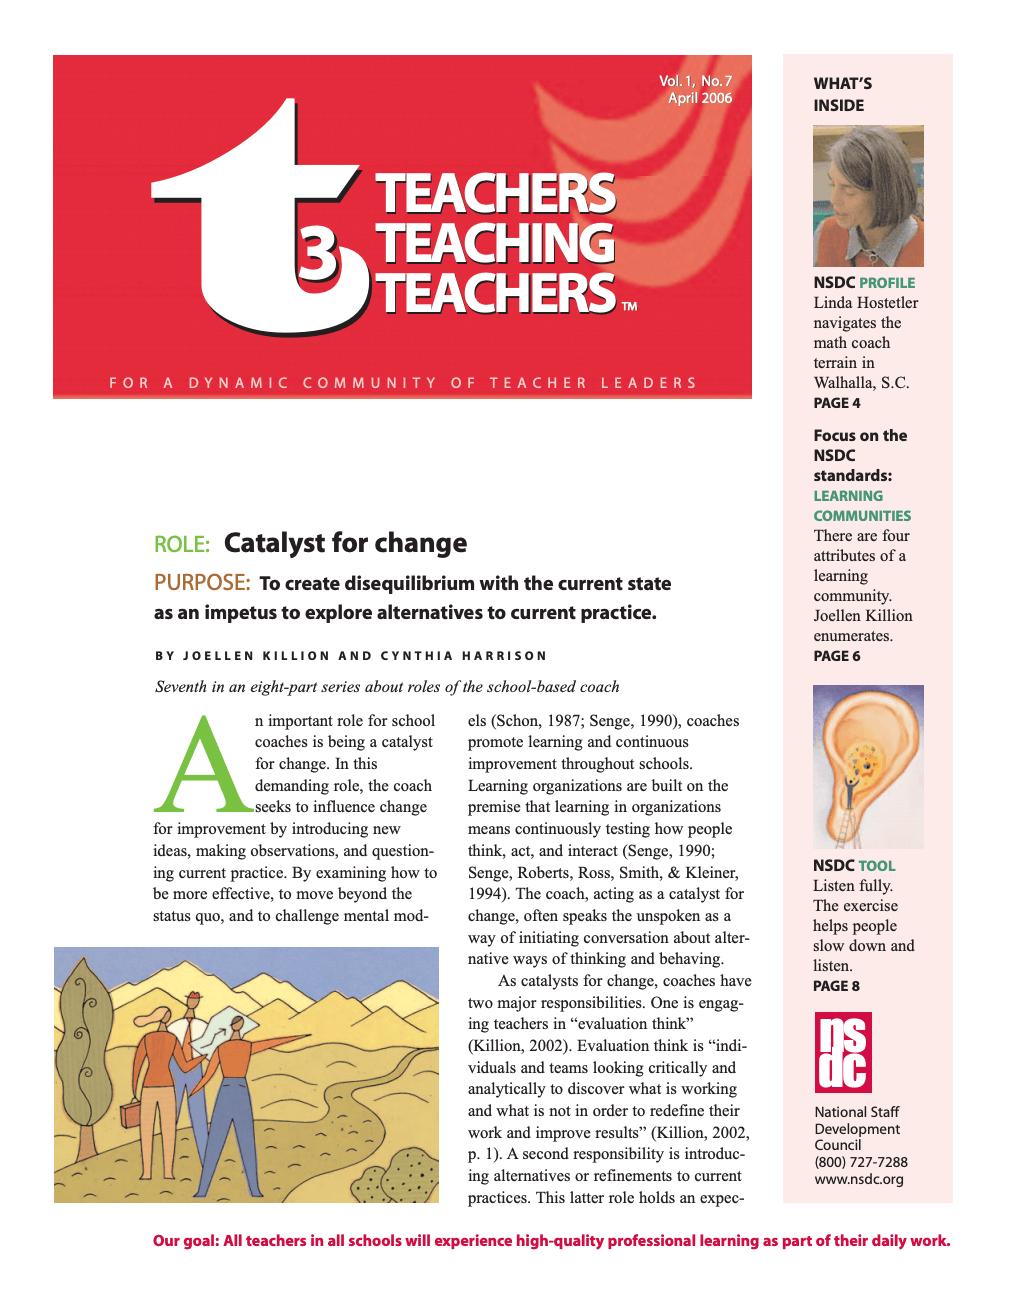 teachers-teaching-teachers-april-2006-vol-1-no-7